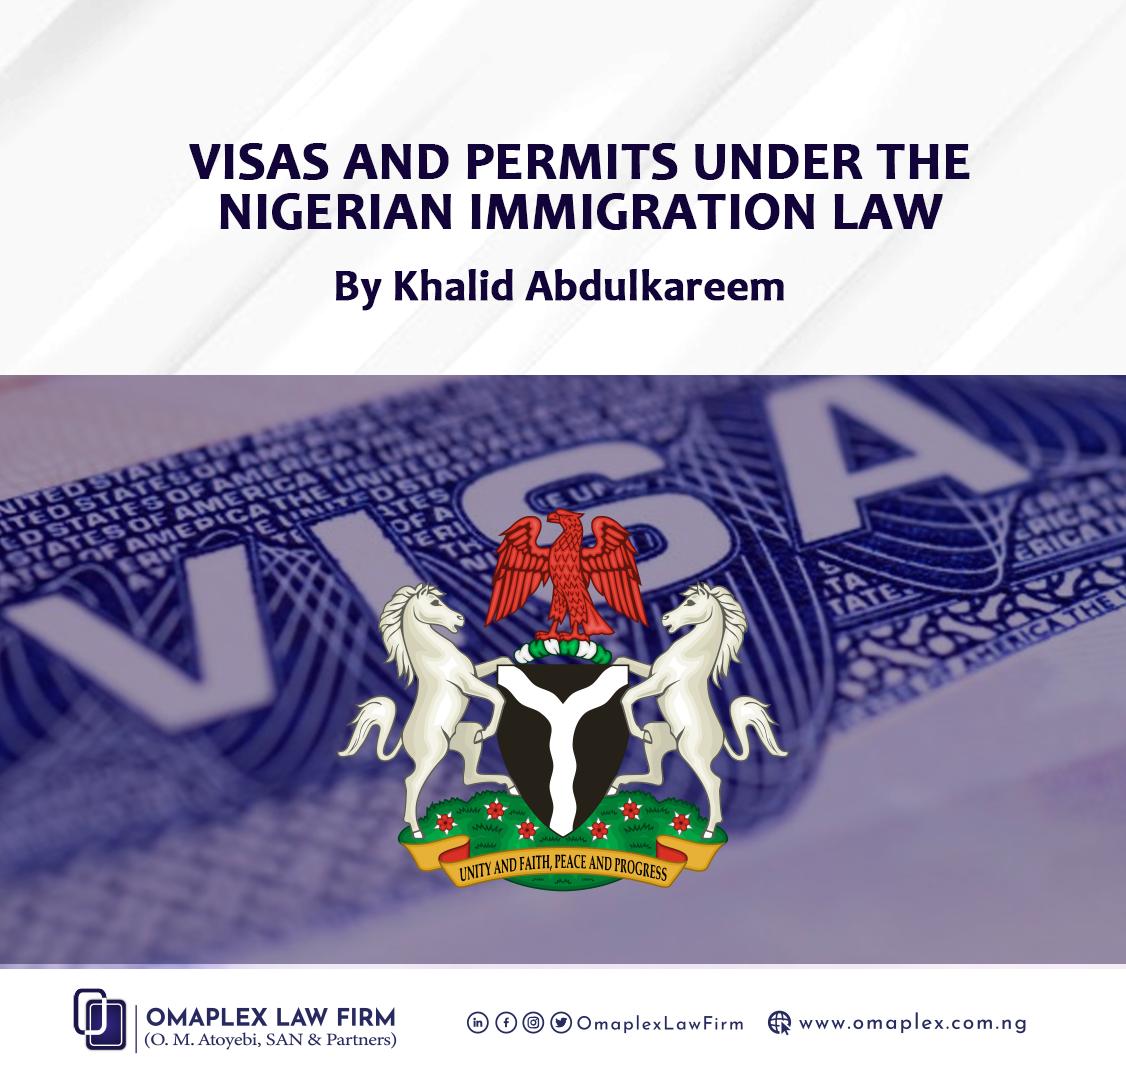 Visas And Permits Under The Nigerian Immigration Law[1]   KHALID ABDULKAREEM